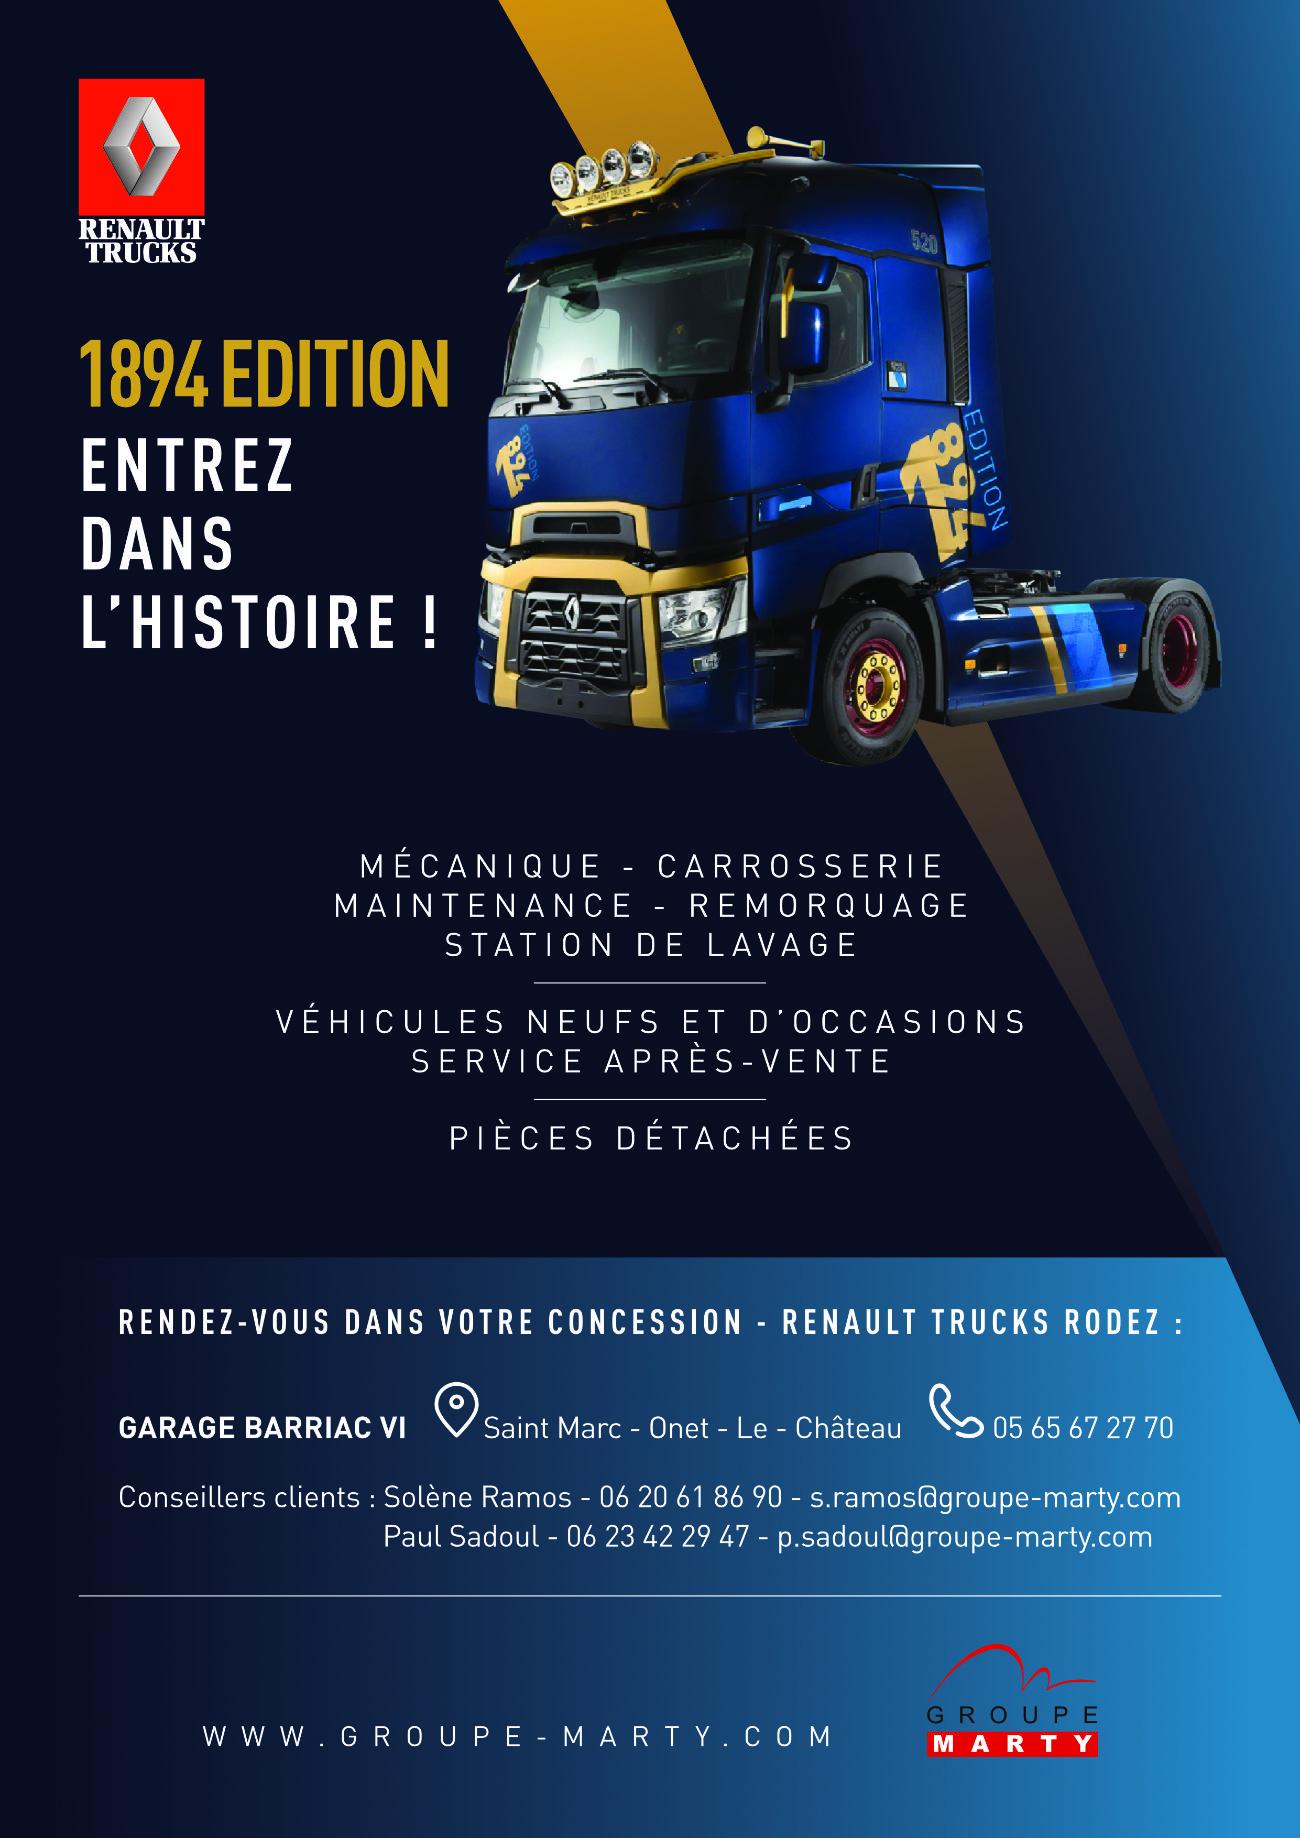 Flyer recto A4 1894 EDITION Renault Trucks